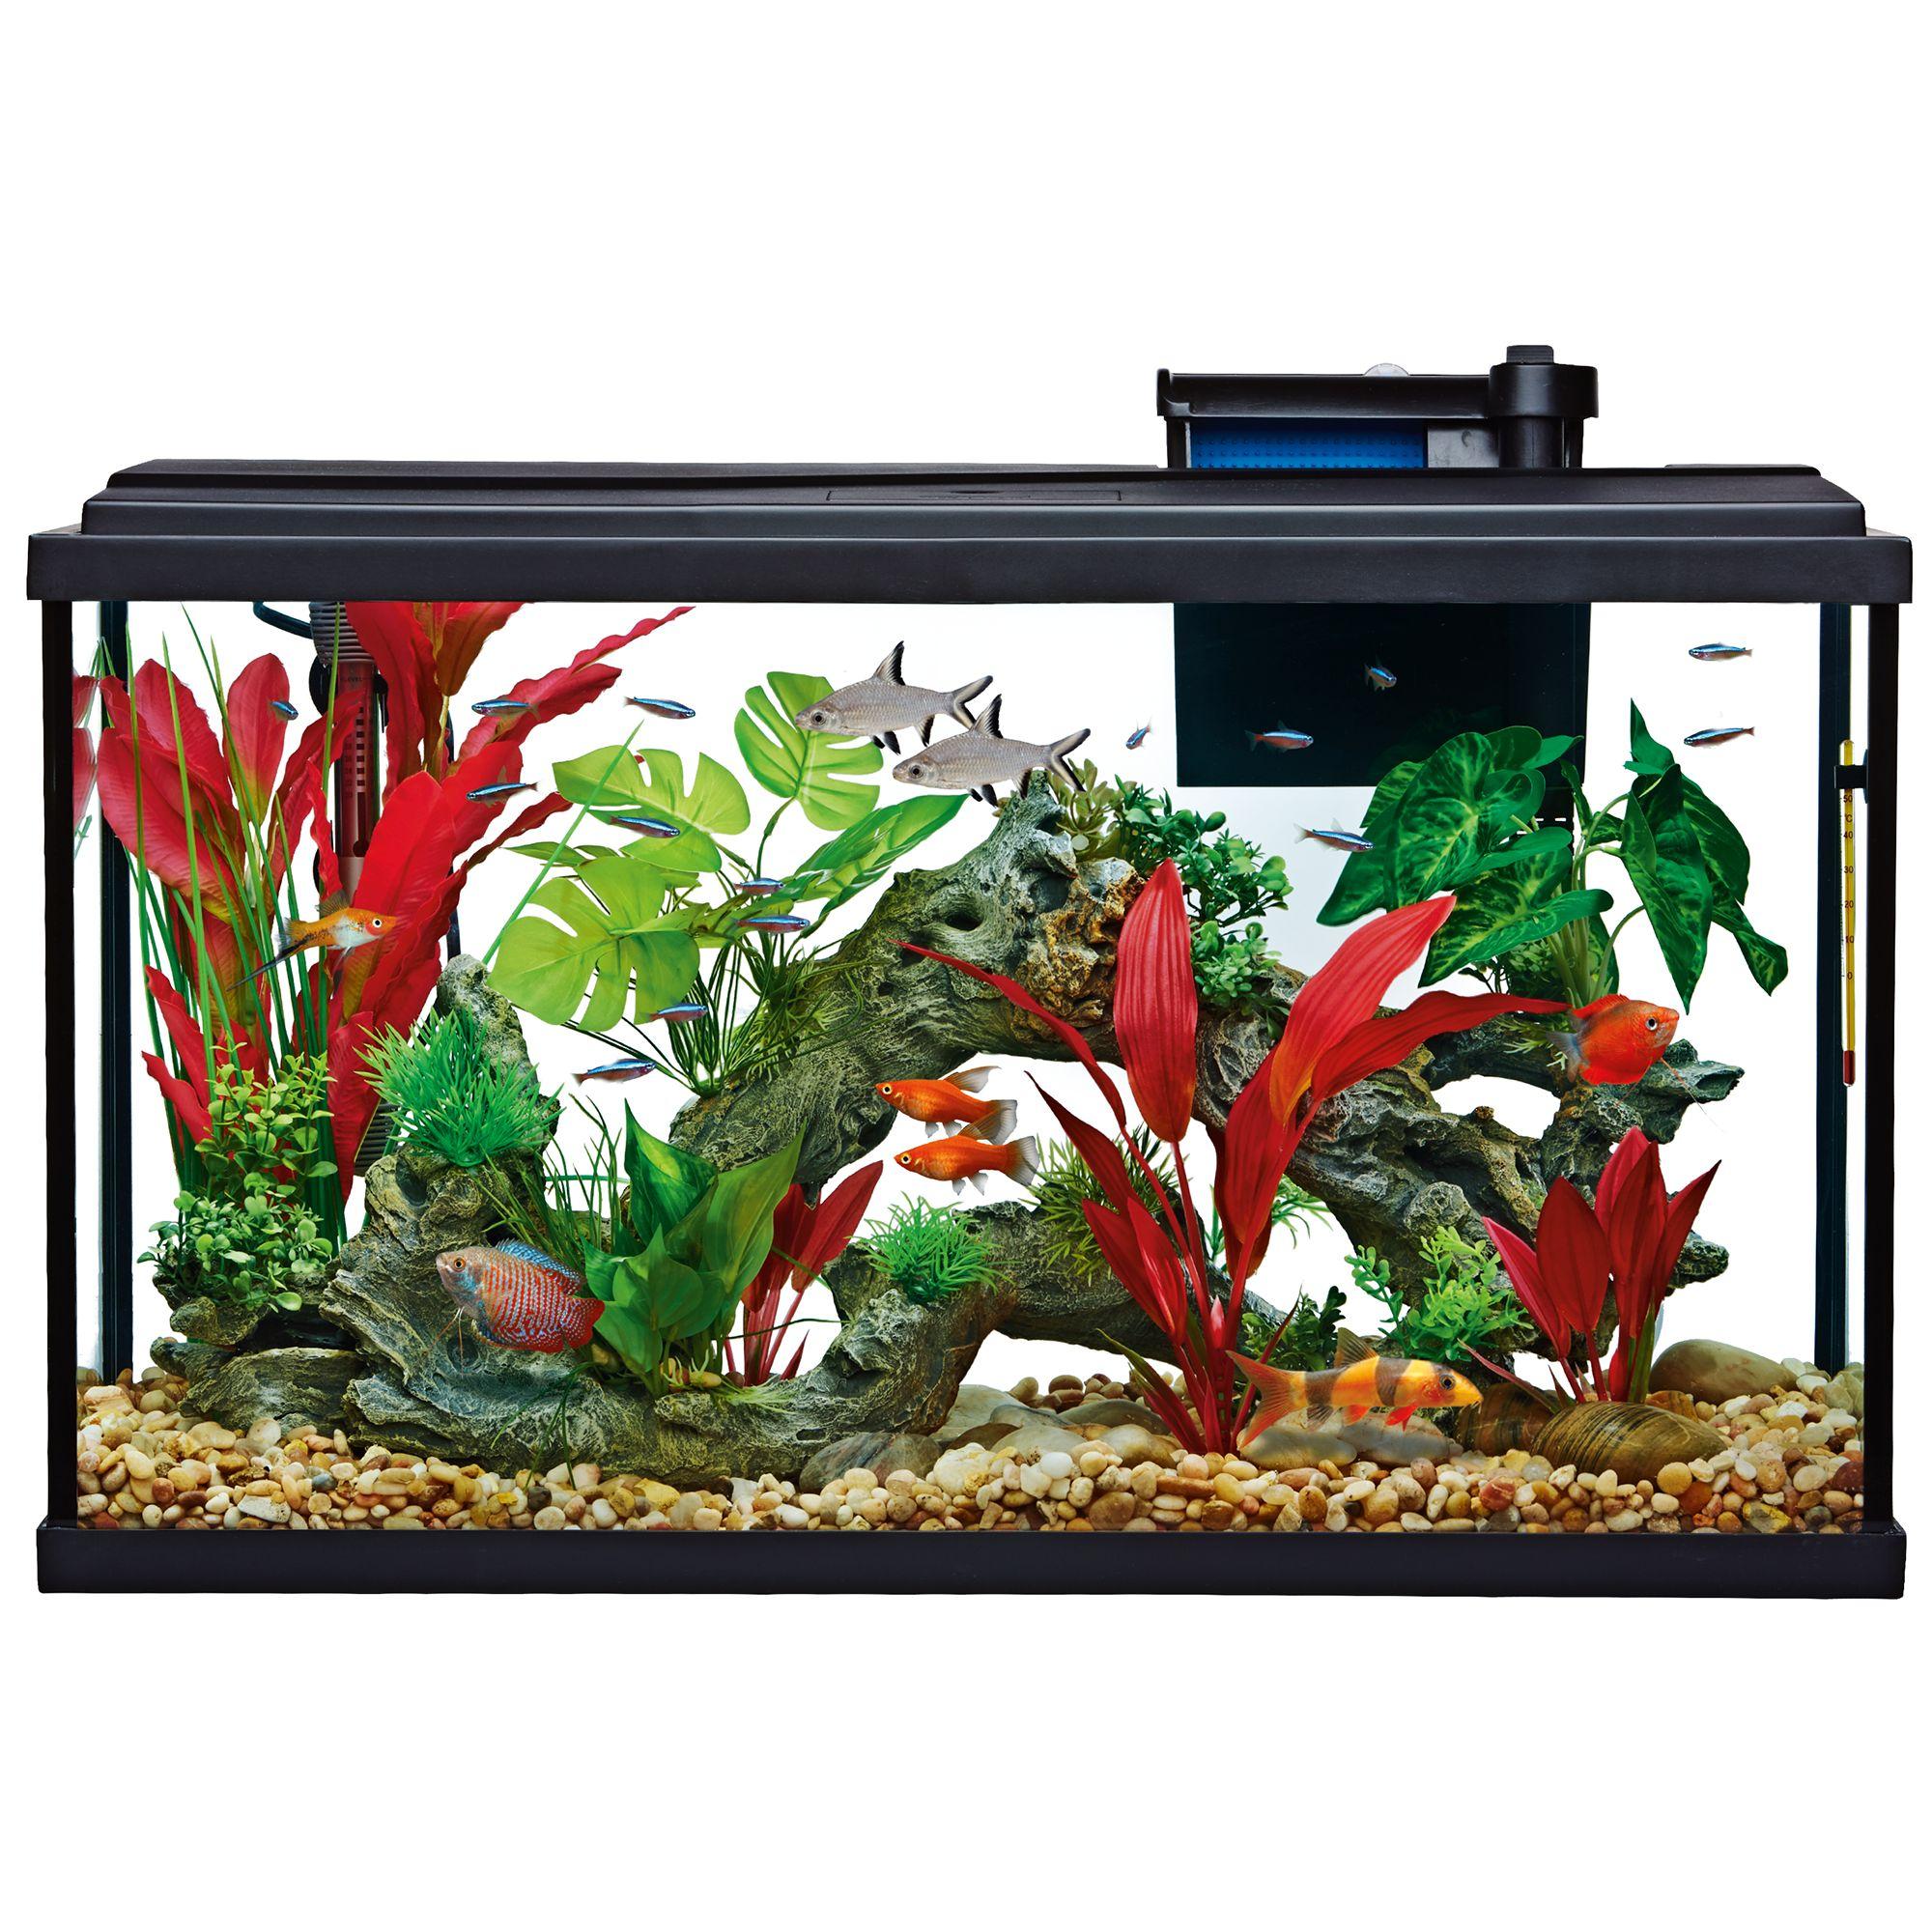 Aquarium top usa page 2 for 29 gallon fish tank dimensions